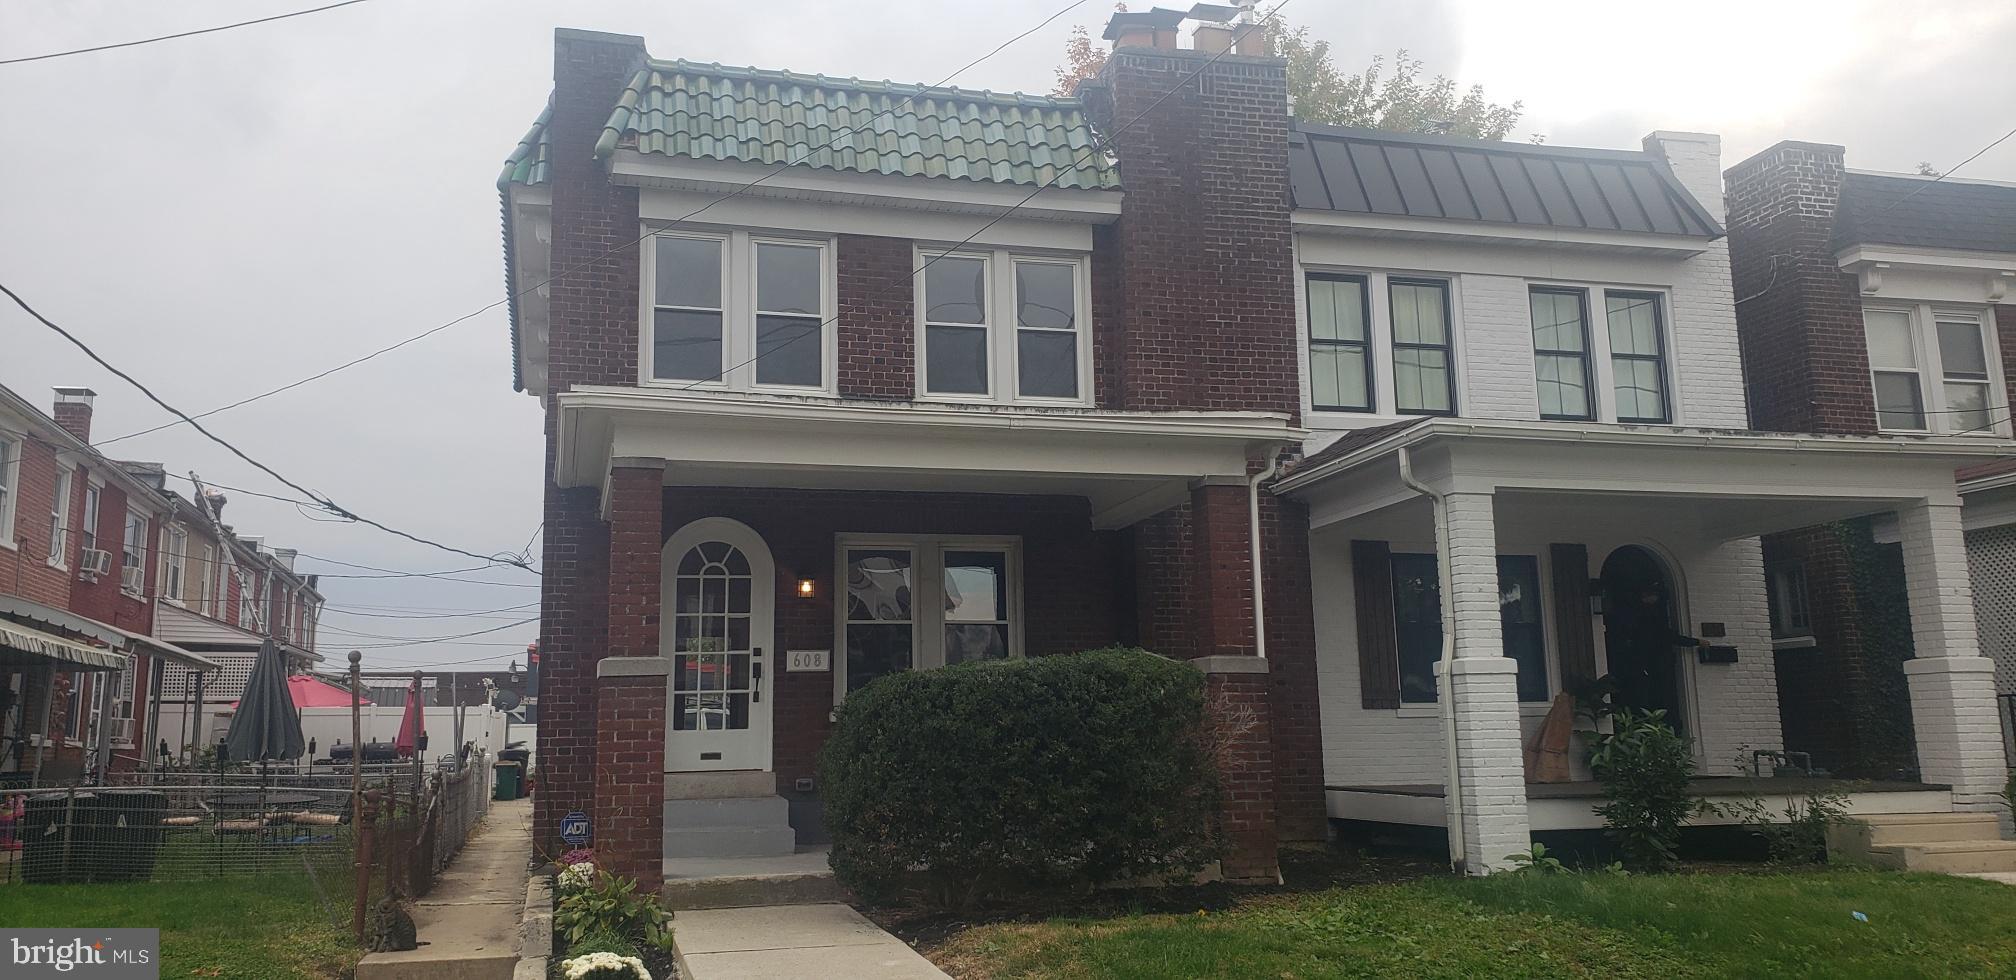 608 N Franklin Street, Lancaster, PA 17602